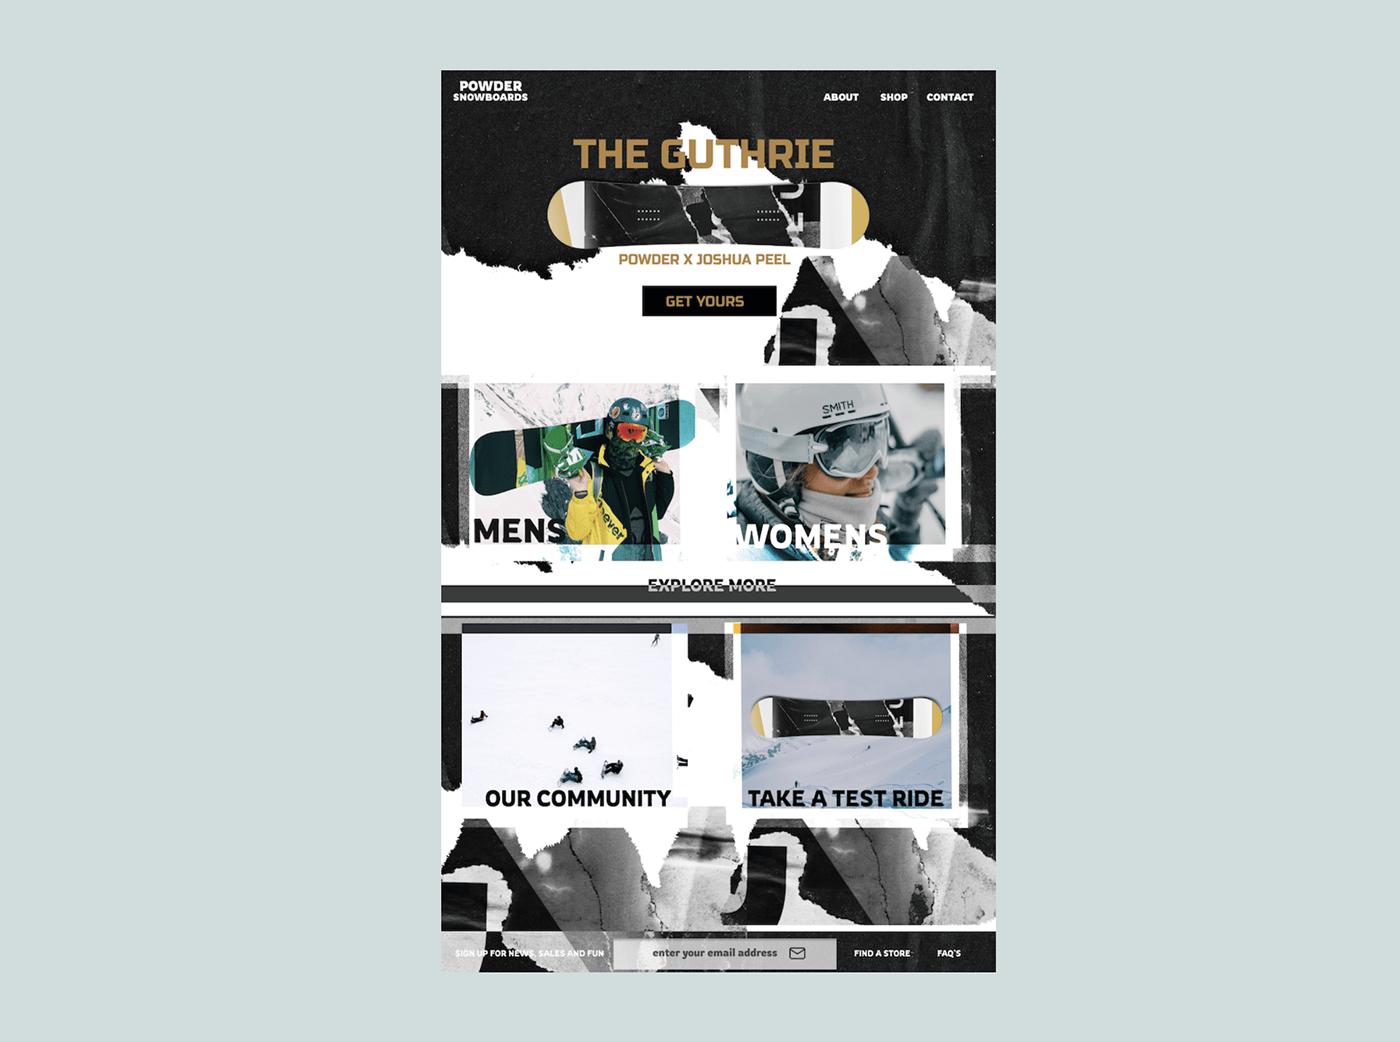 design designer landingpage productdesign UI websitedesign